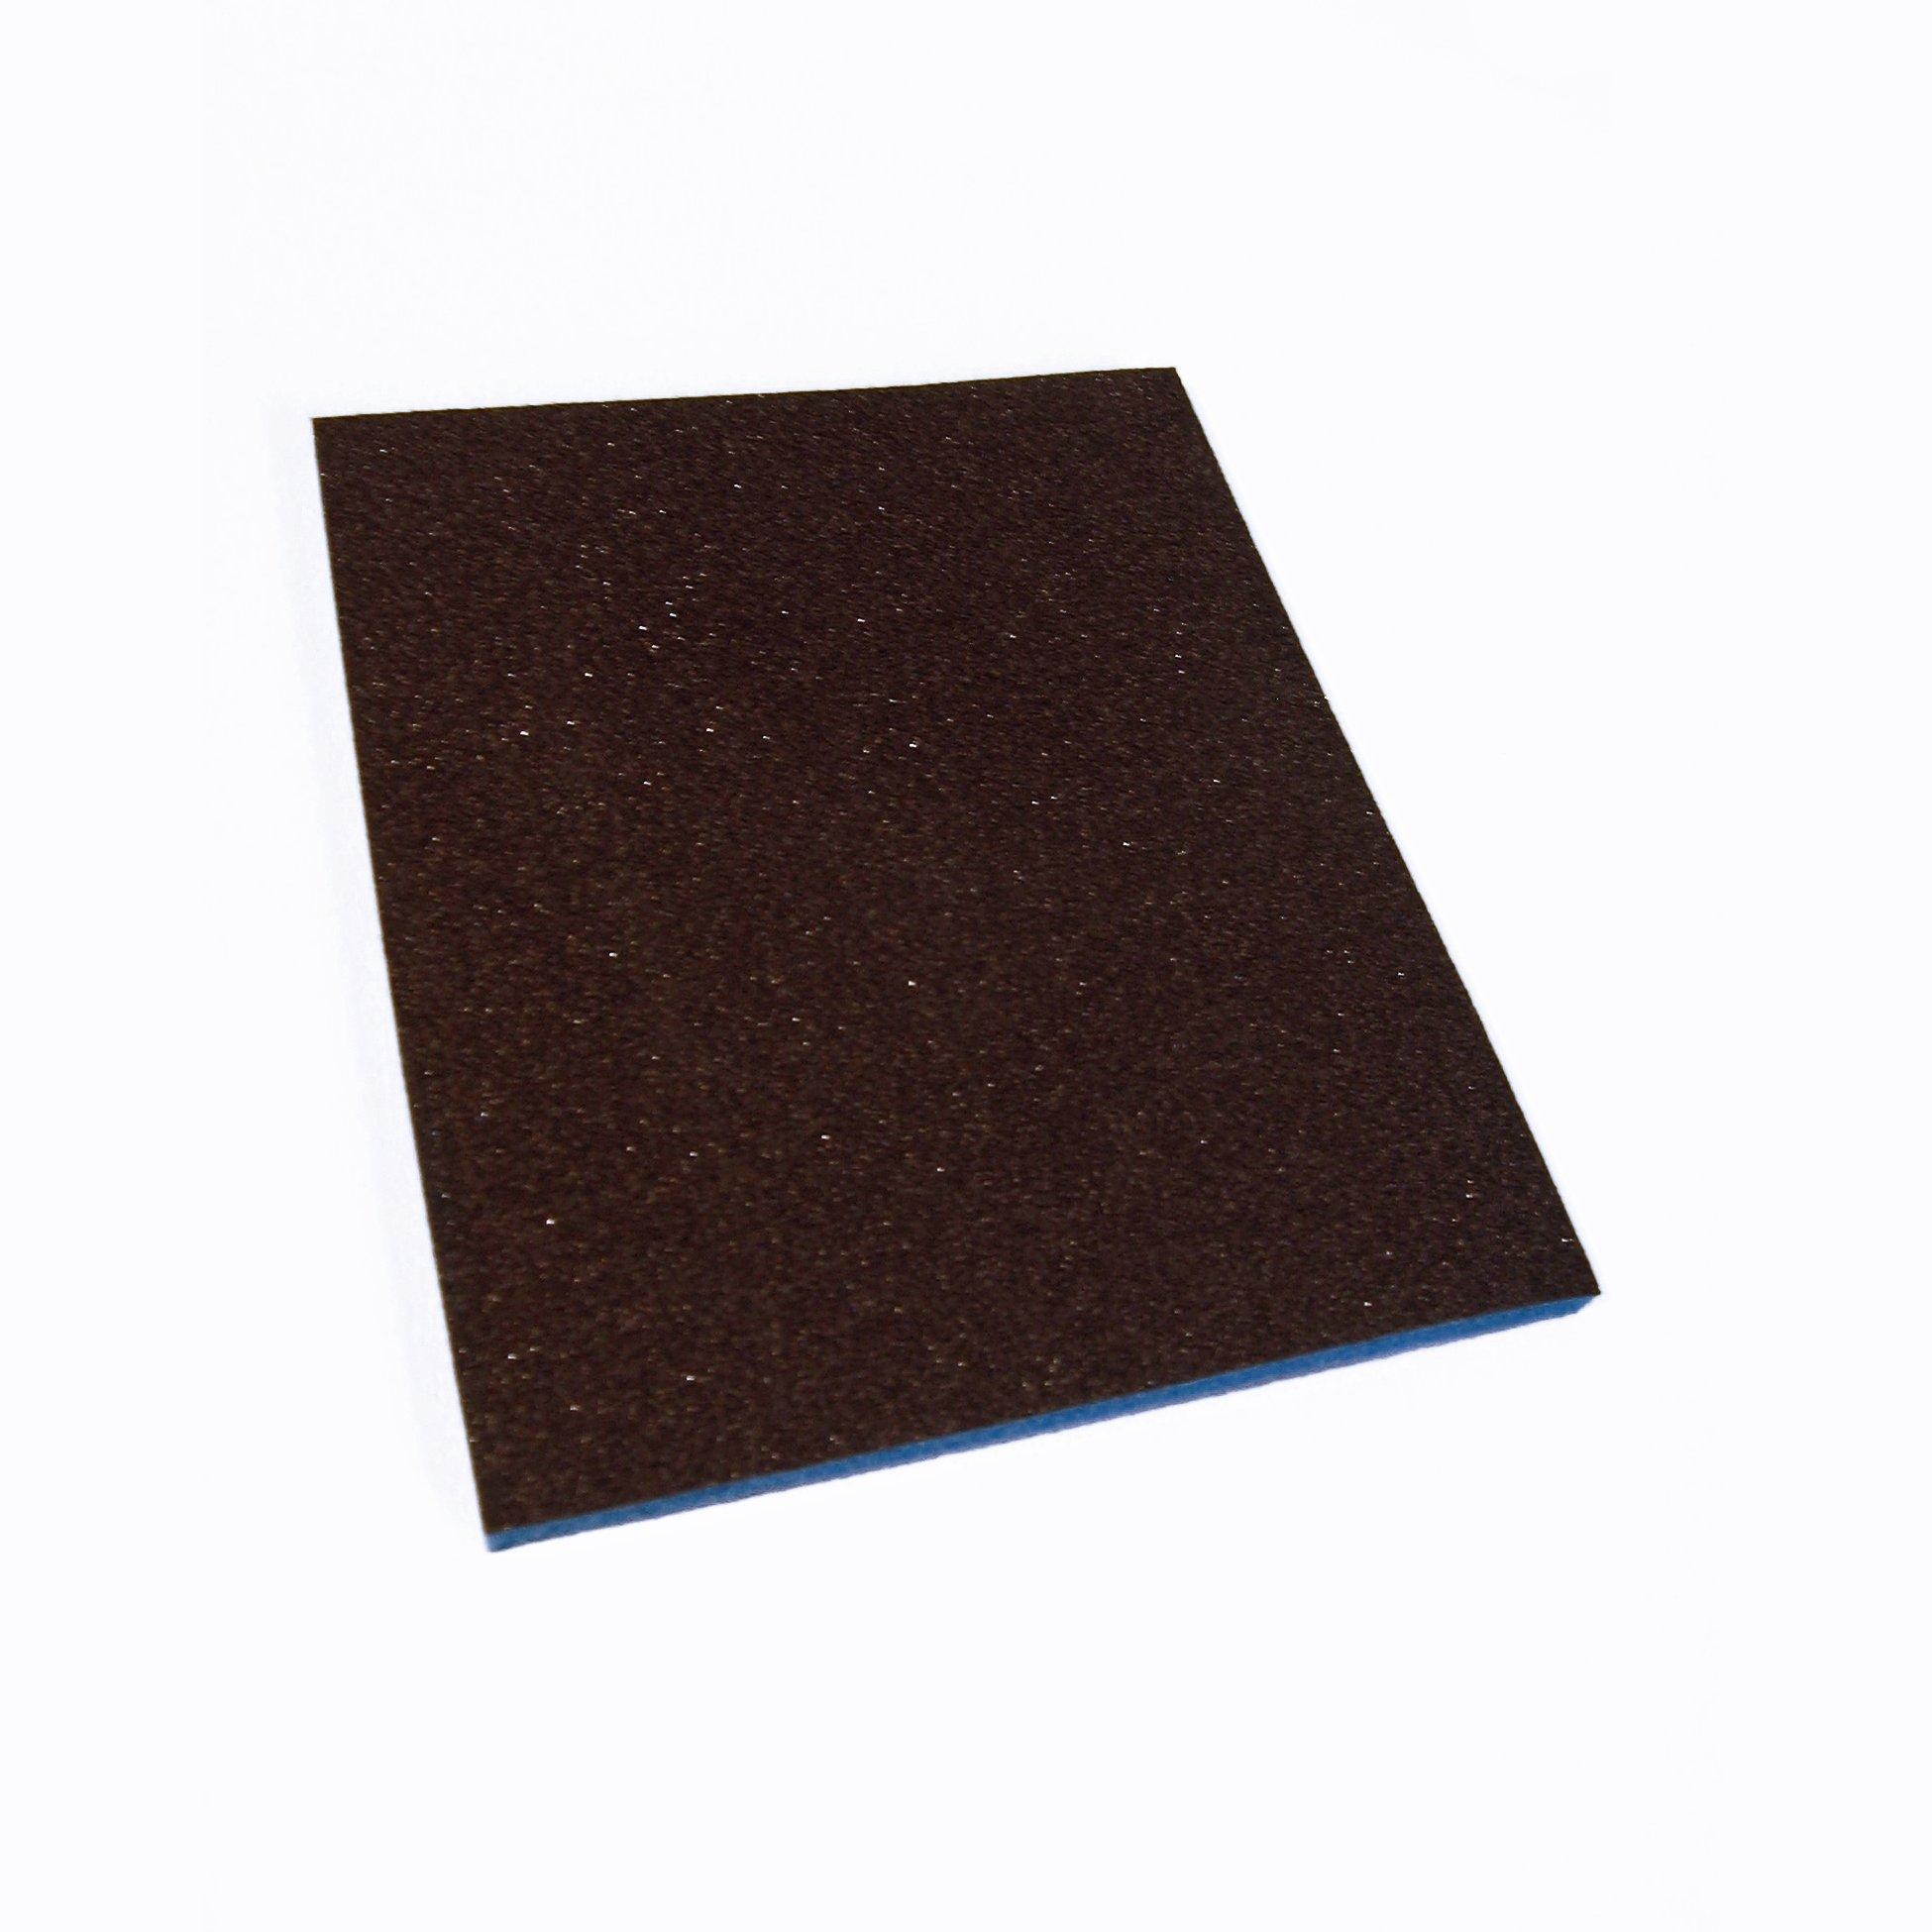 Webb Abrasives 310046 Detail Pad Sanding Sponges (24 Pack), Medium Grit, 4 1/4'' X 5 1/4'' X 1/4''